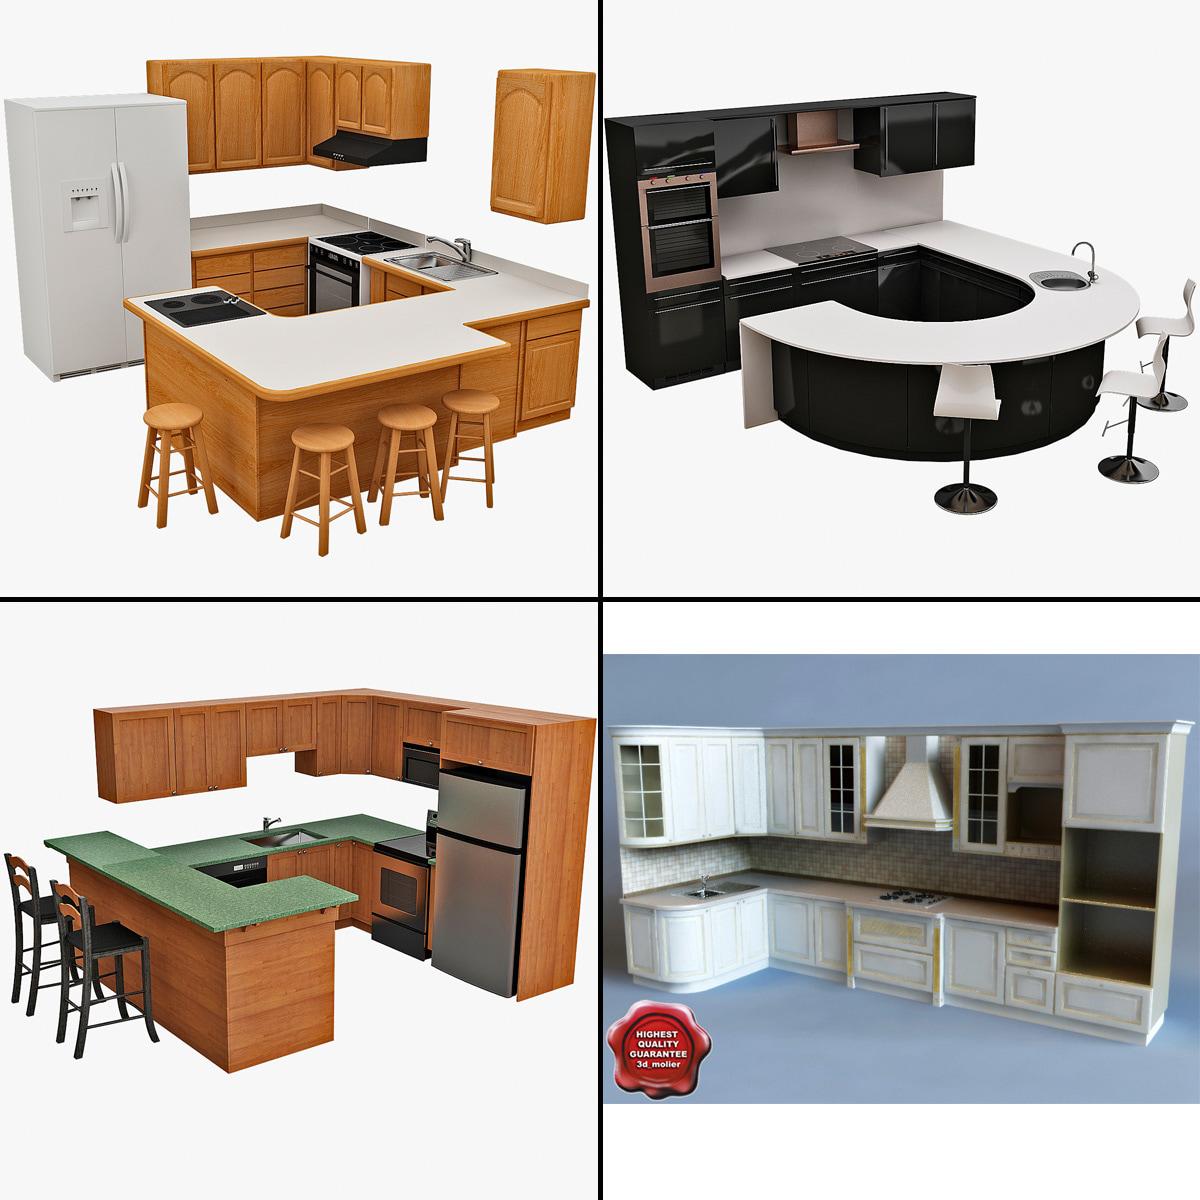 Kitchens_Collection_V2_000.jpg